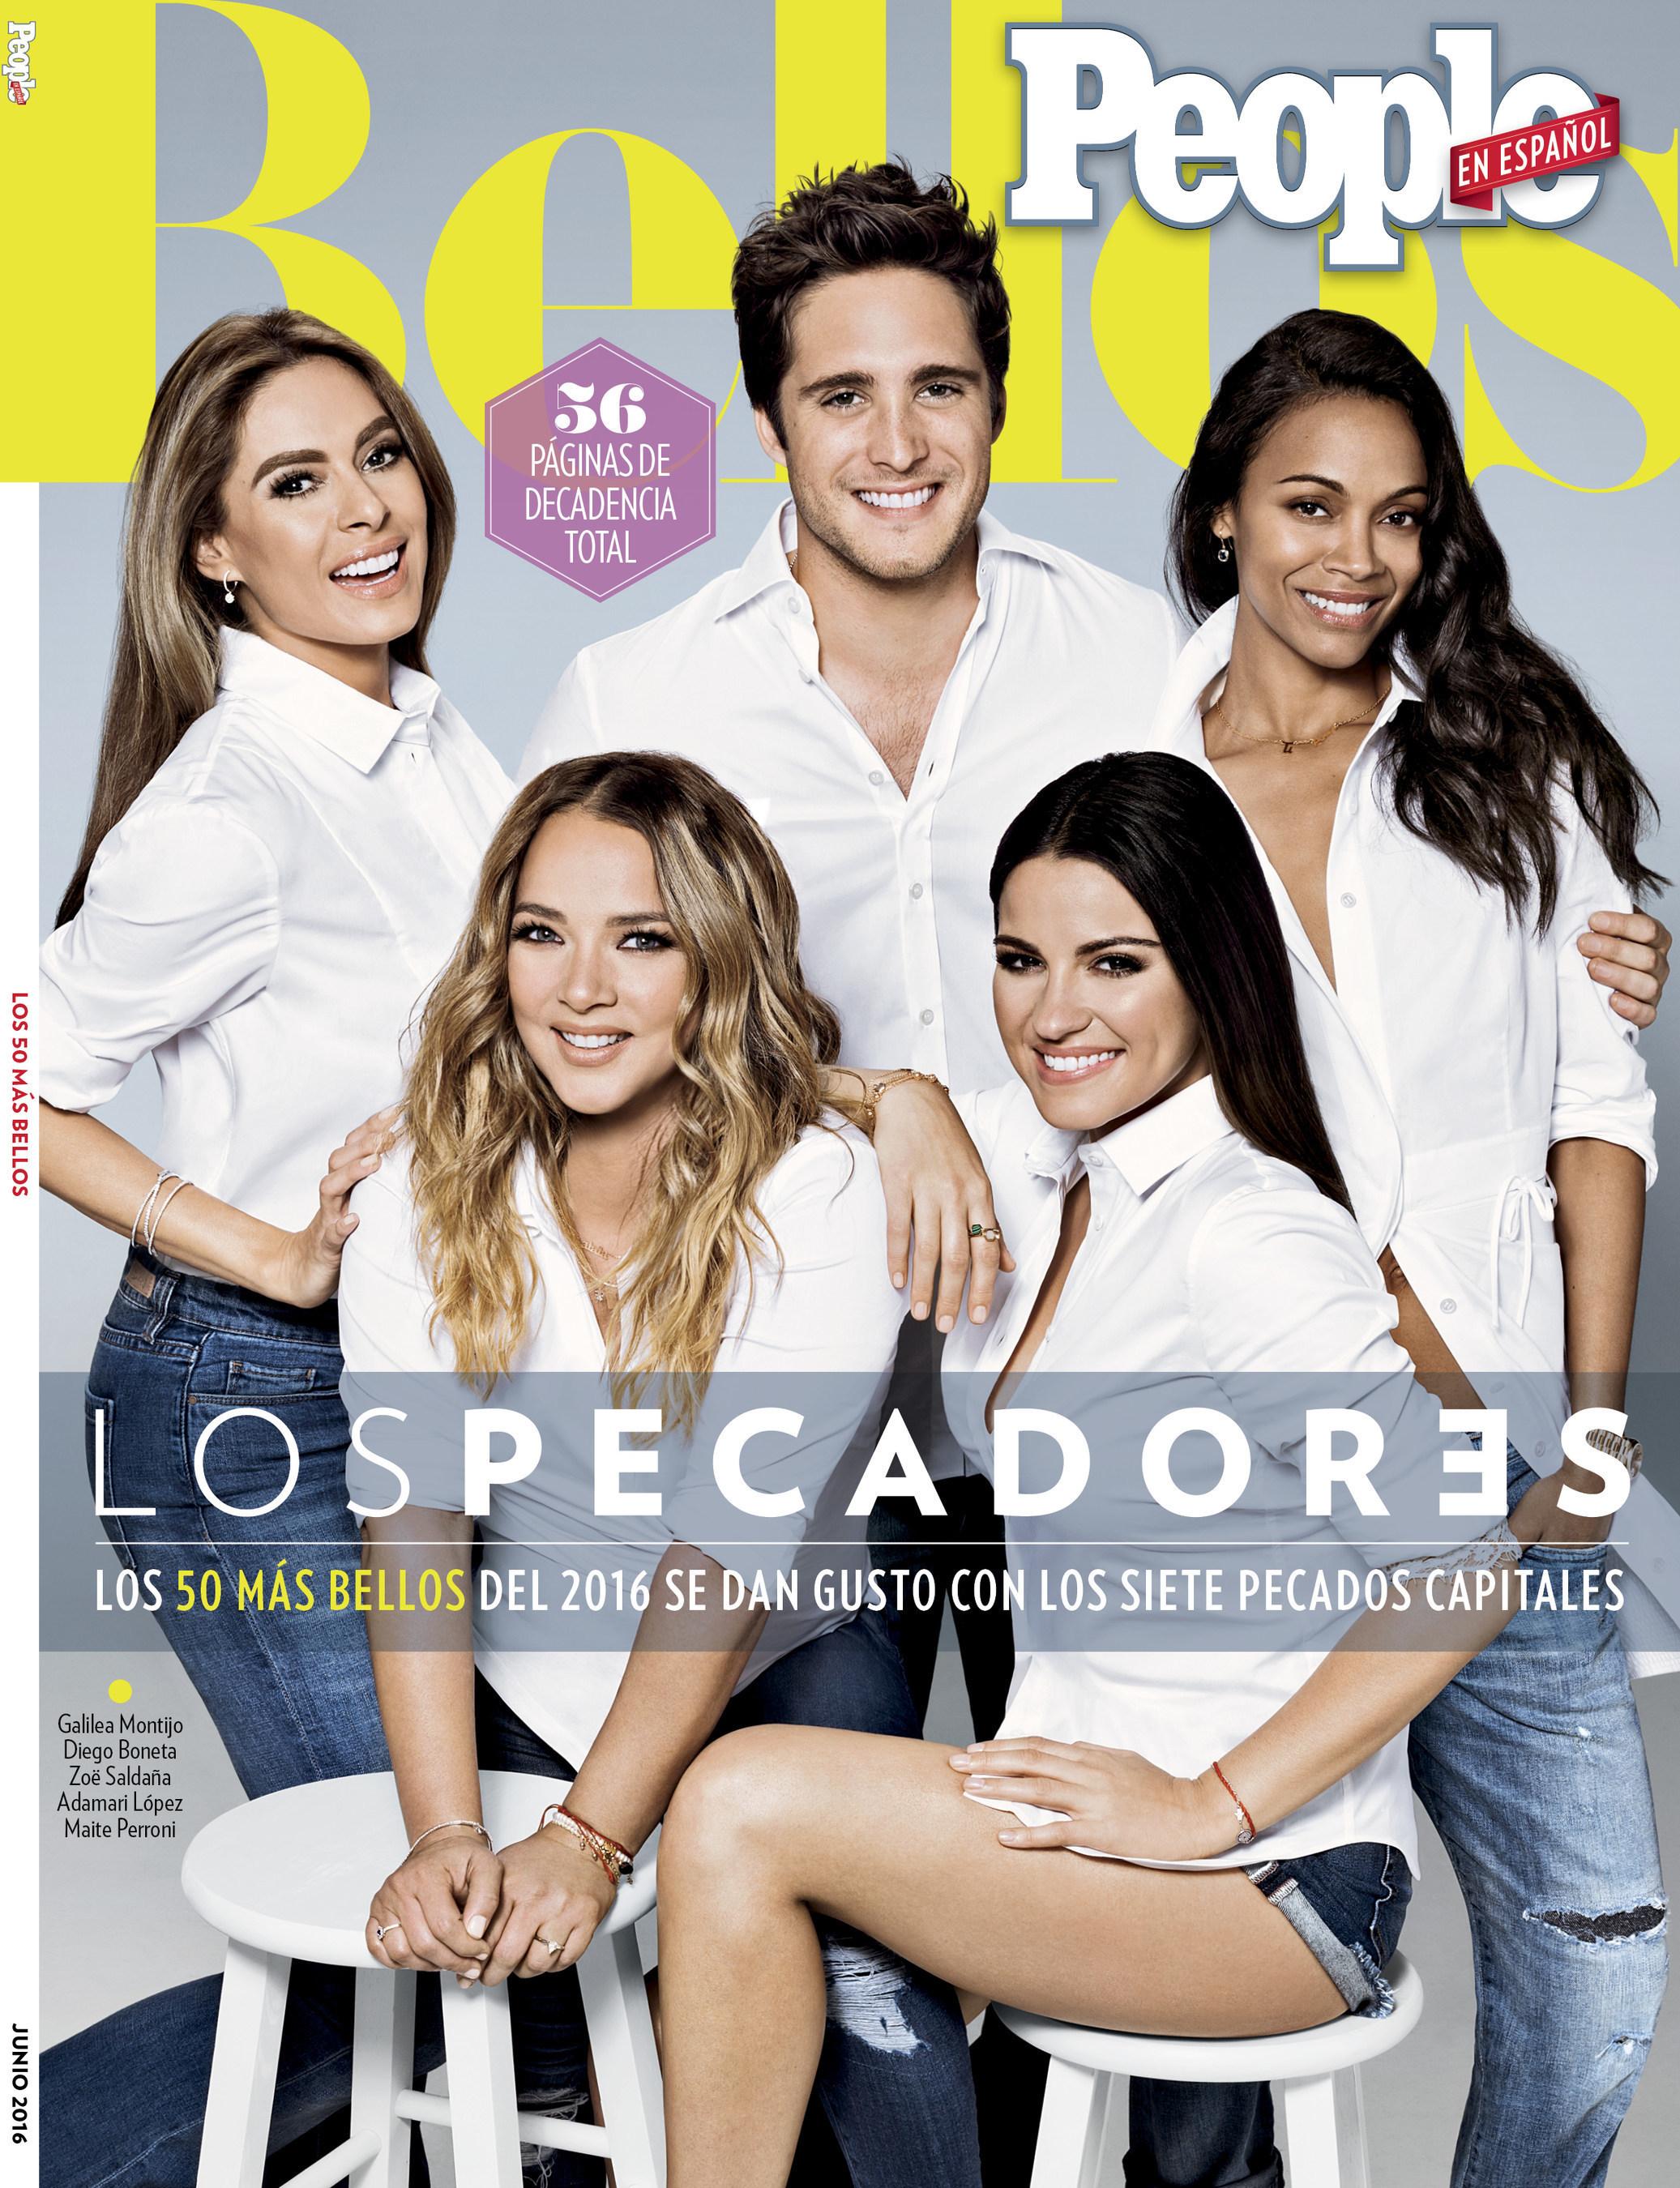 People En Espaol Names The 50 Most Beautiful Hispanic -8154